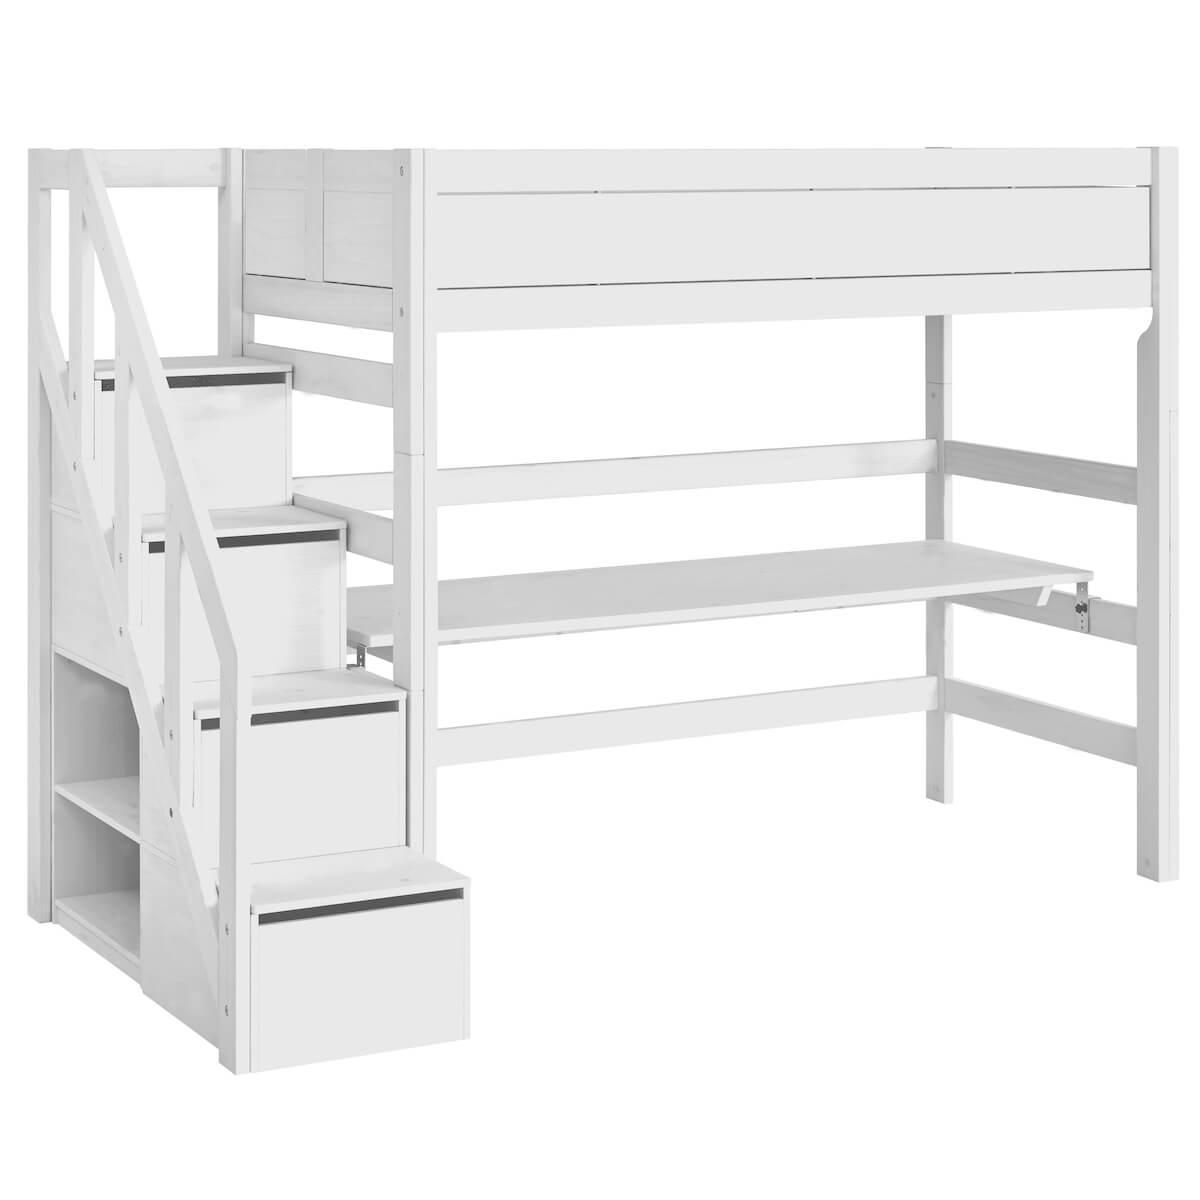 Hochbett 90x200cm Treppe Lifetime Weiß